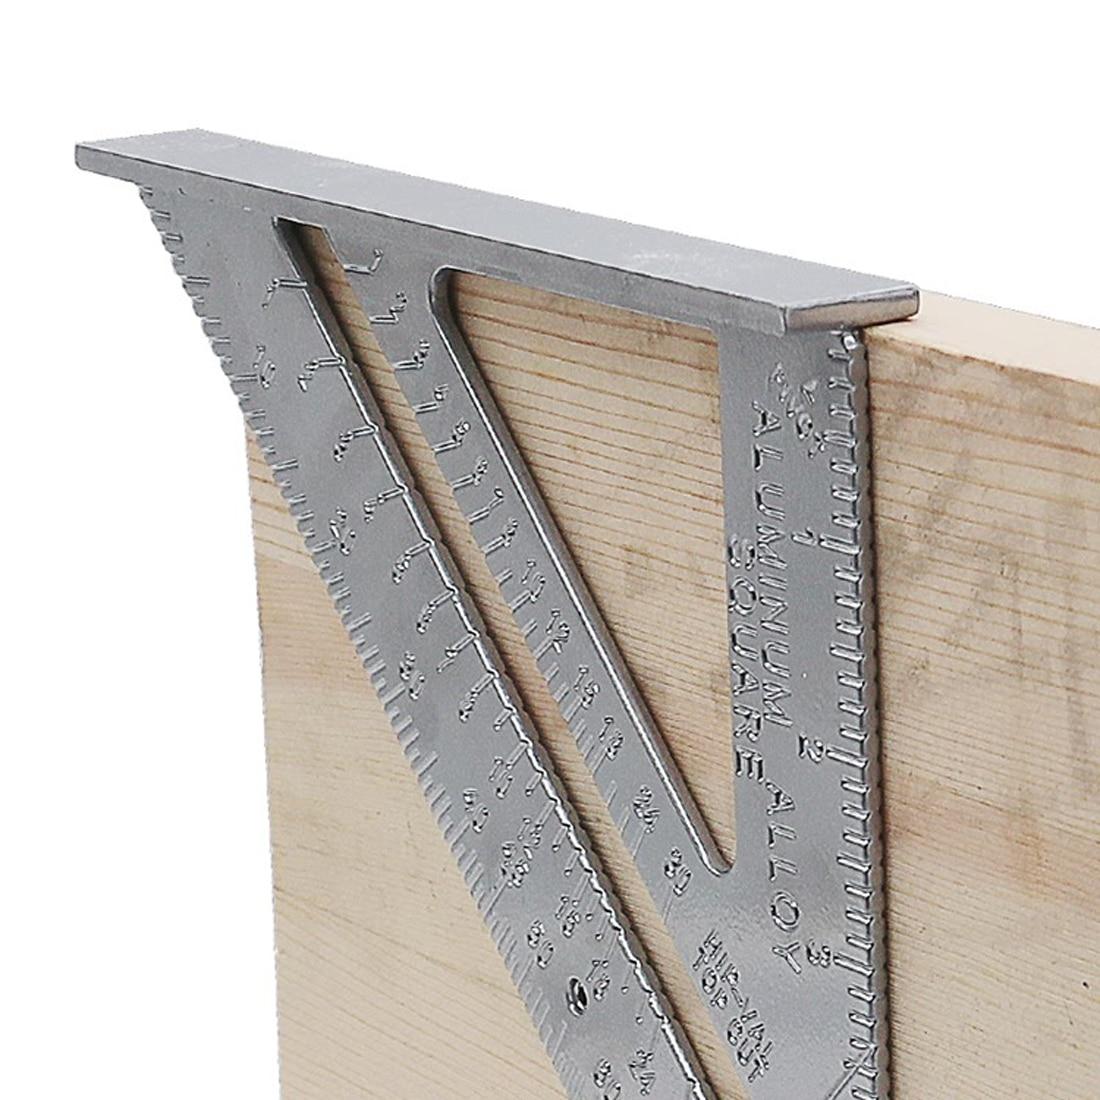 Tri-square Line Scriber Saw Guide Measurement Inch Carpenter Ruler Speed Square Protractor Aluminum Alloy Miter Framing aluminum alloy t general pervez musharraf held hole hole crossed feet carpenter scriber